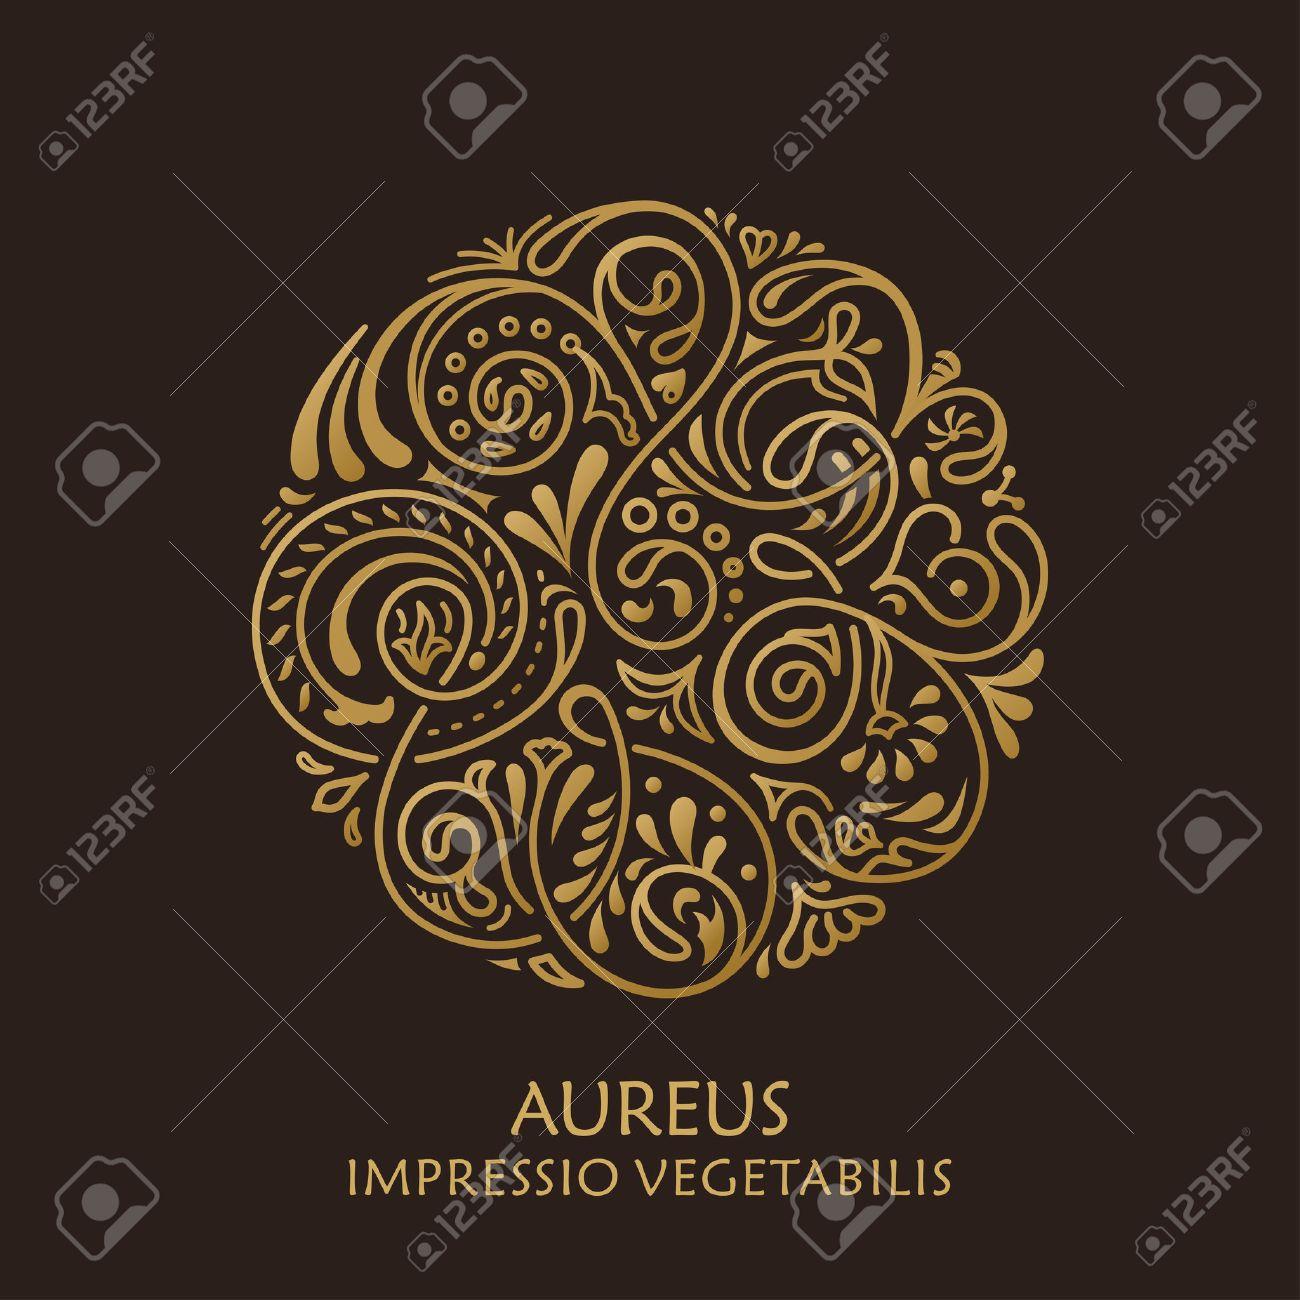 Round calligraphic emblem. Vector floral symbol for cafe, restaurant, shop, print, stamp. Logo design template label for coffee, tea, mug, business card. Isolated ornament - 51830398